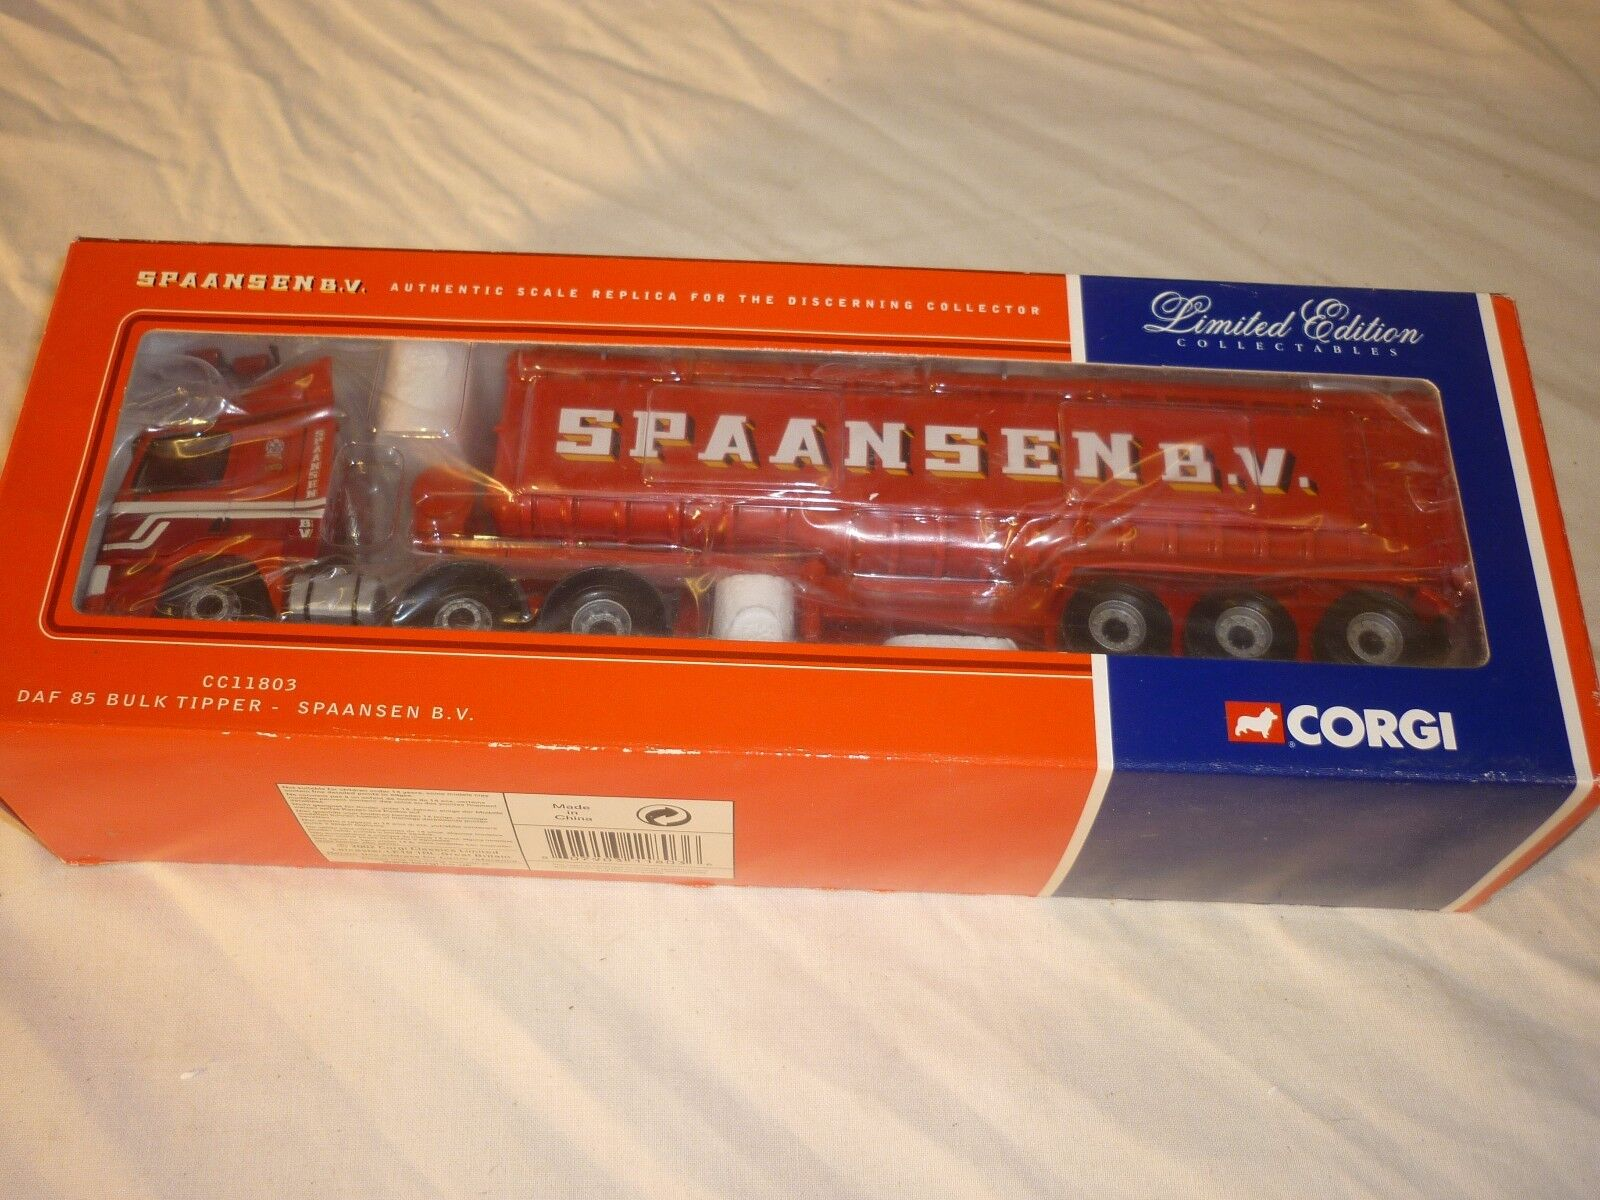 CORGI CC11803, DAF 85, CON MASSA Tipper, spaansen Segue